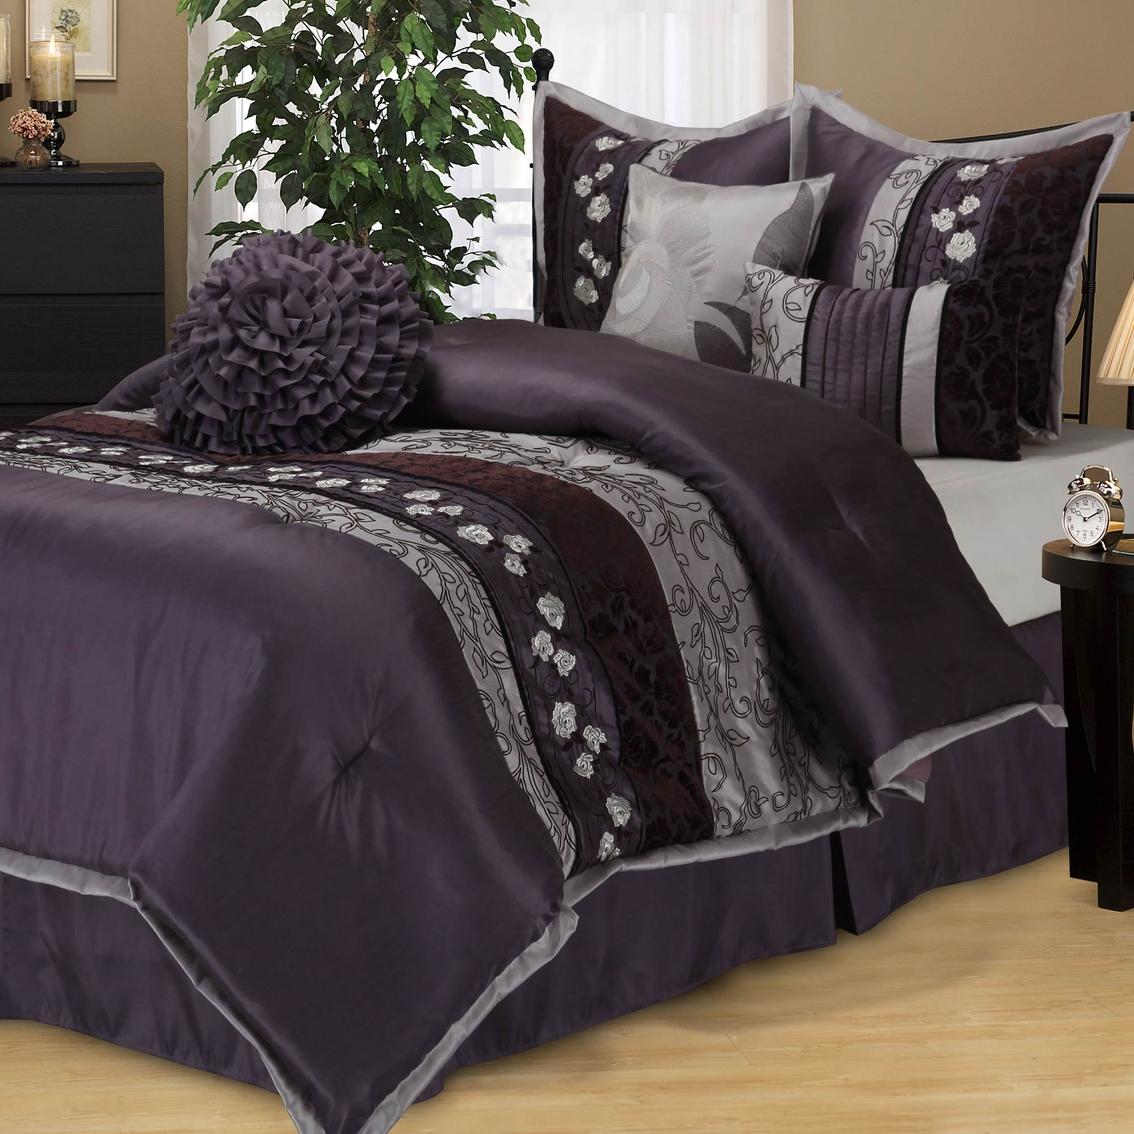 Nanshing America Riley 7 Pc Bedding Set Bedding Sets Household Shop The Exchange